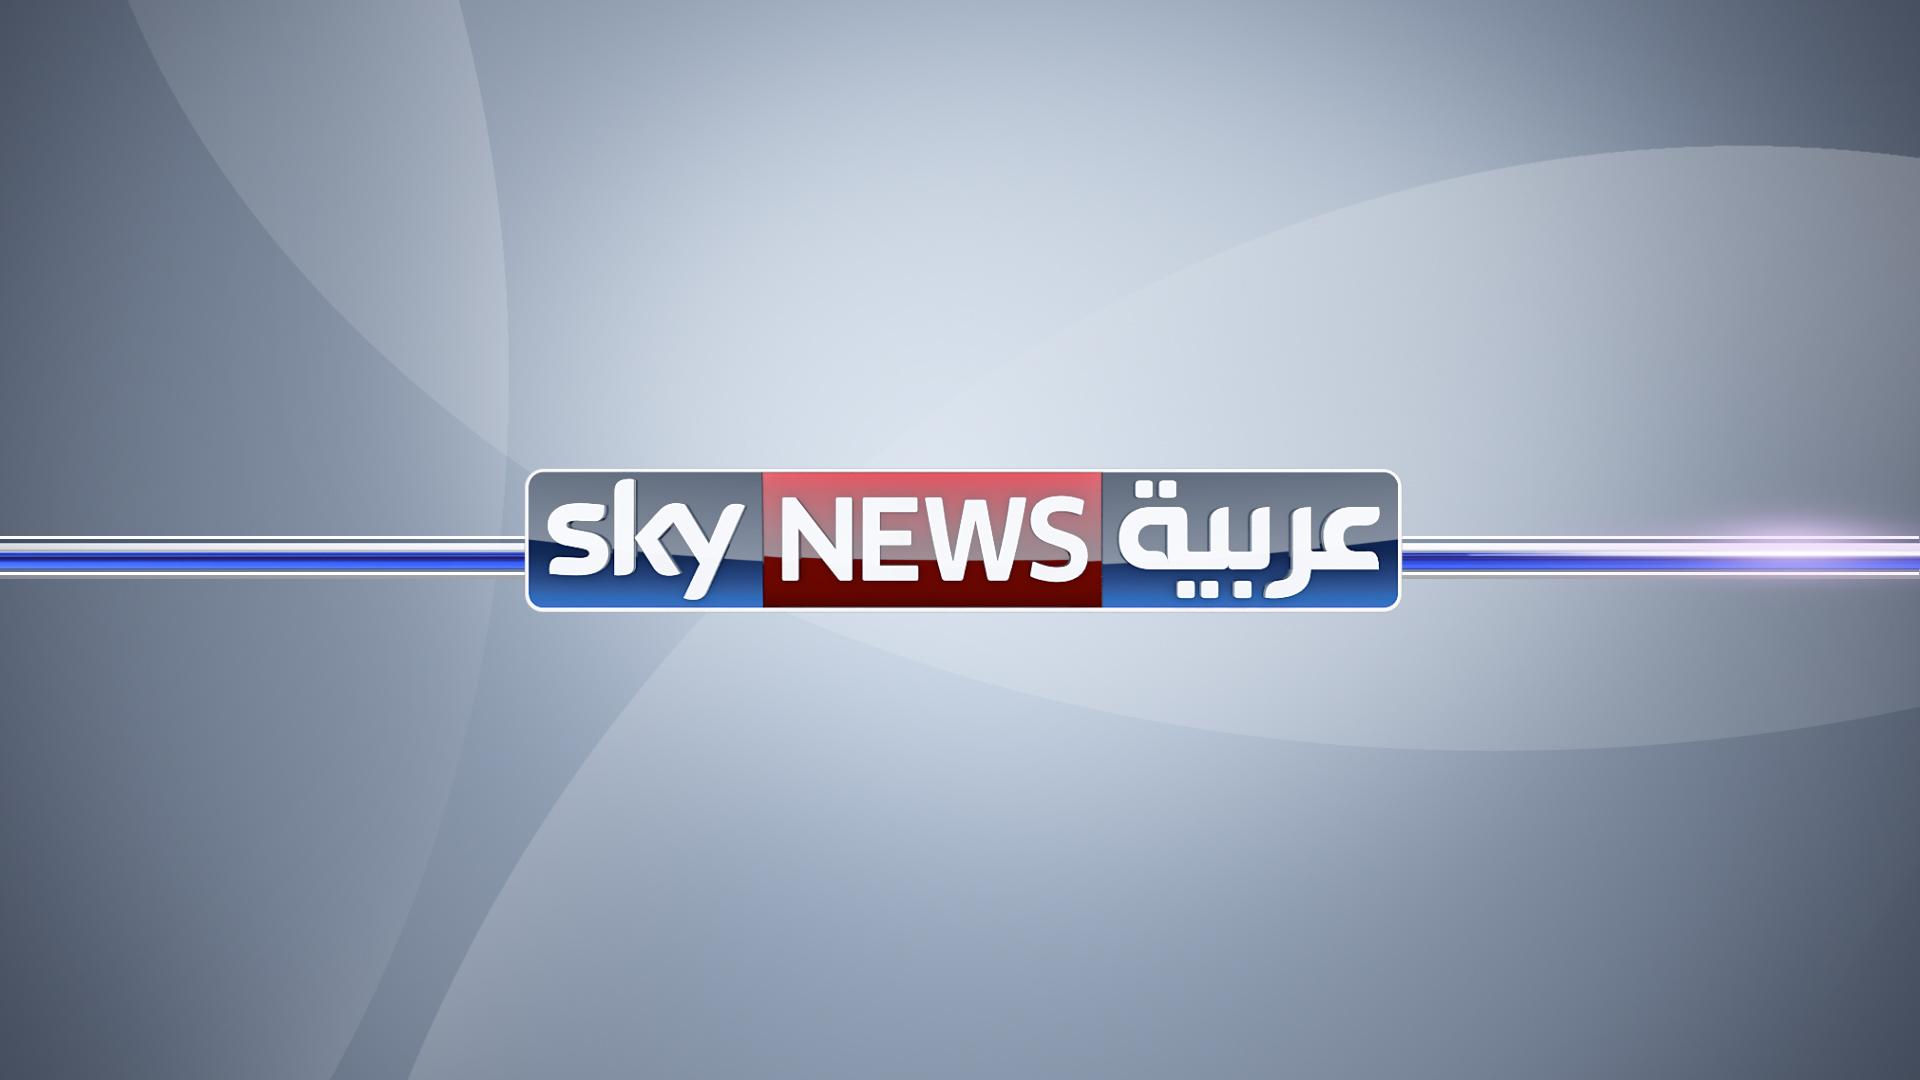 NCS_Sky-News_011